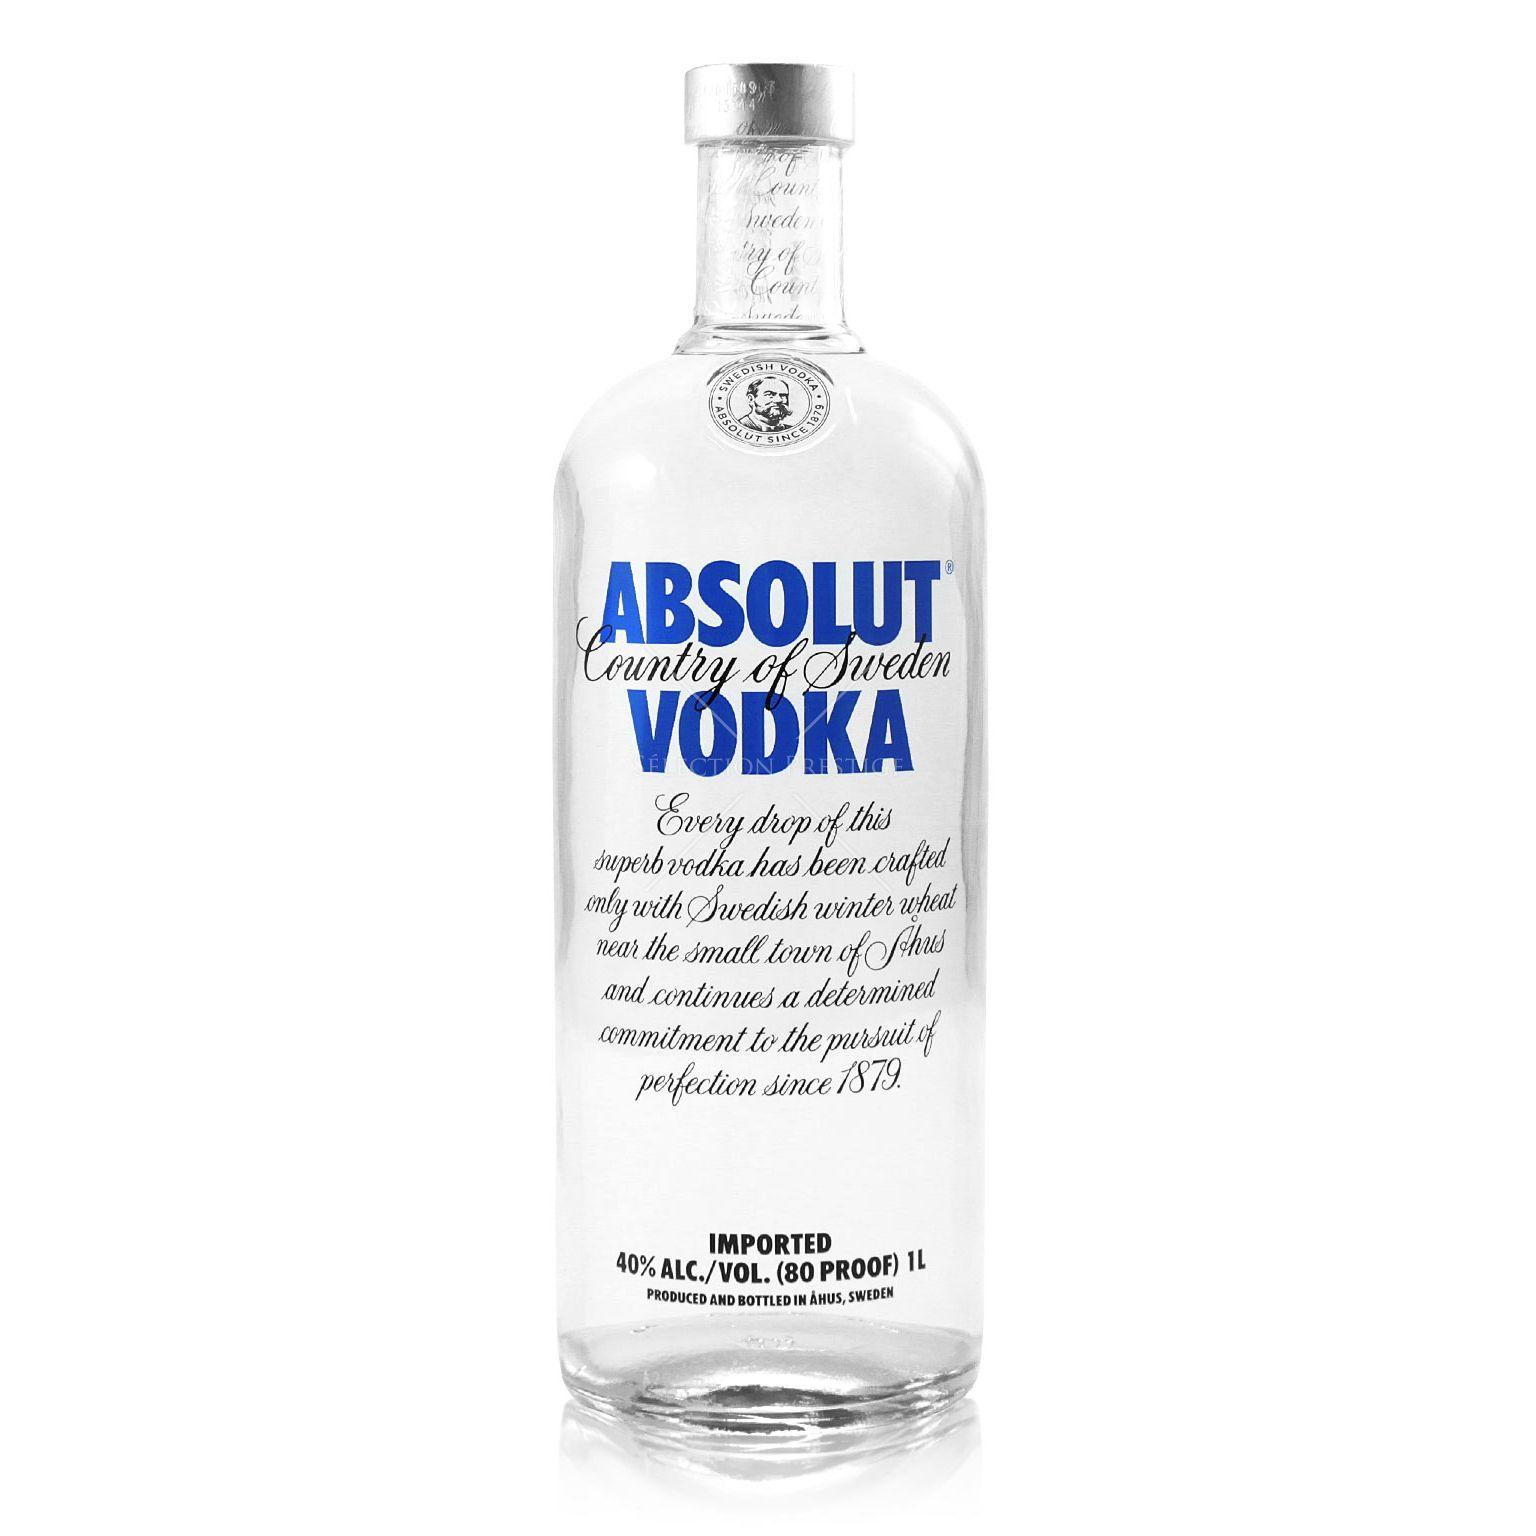 Absolut Vodka 21 89 Usd Regalos Pa L Housewarming Vodka